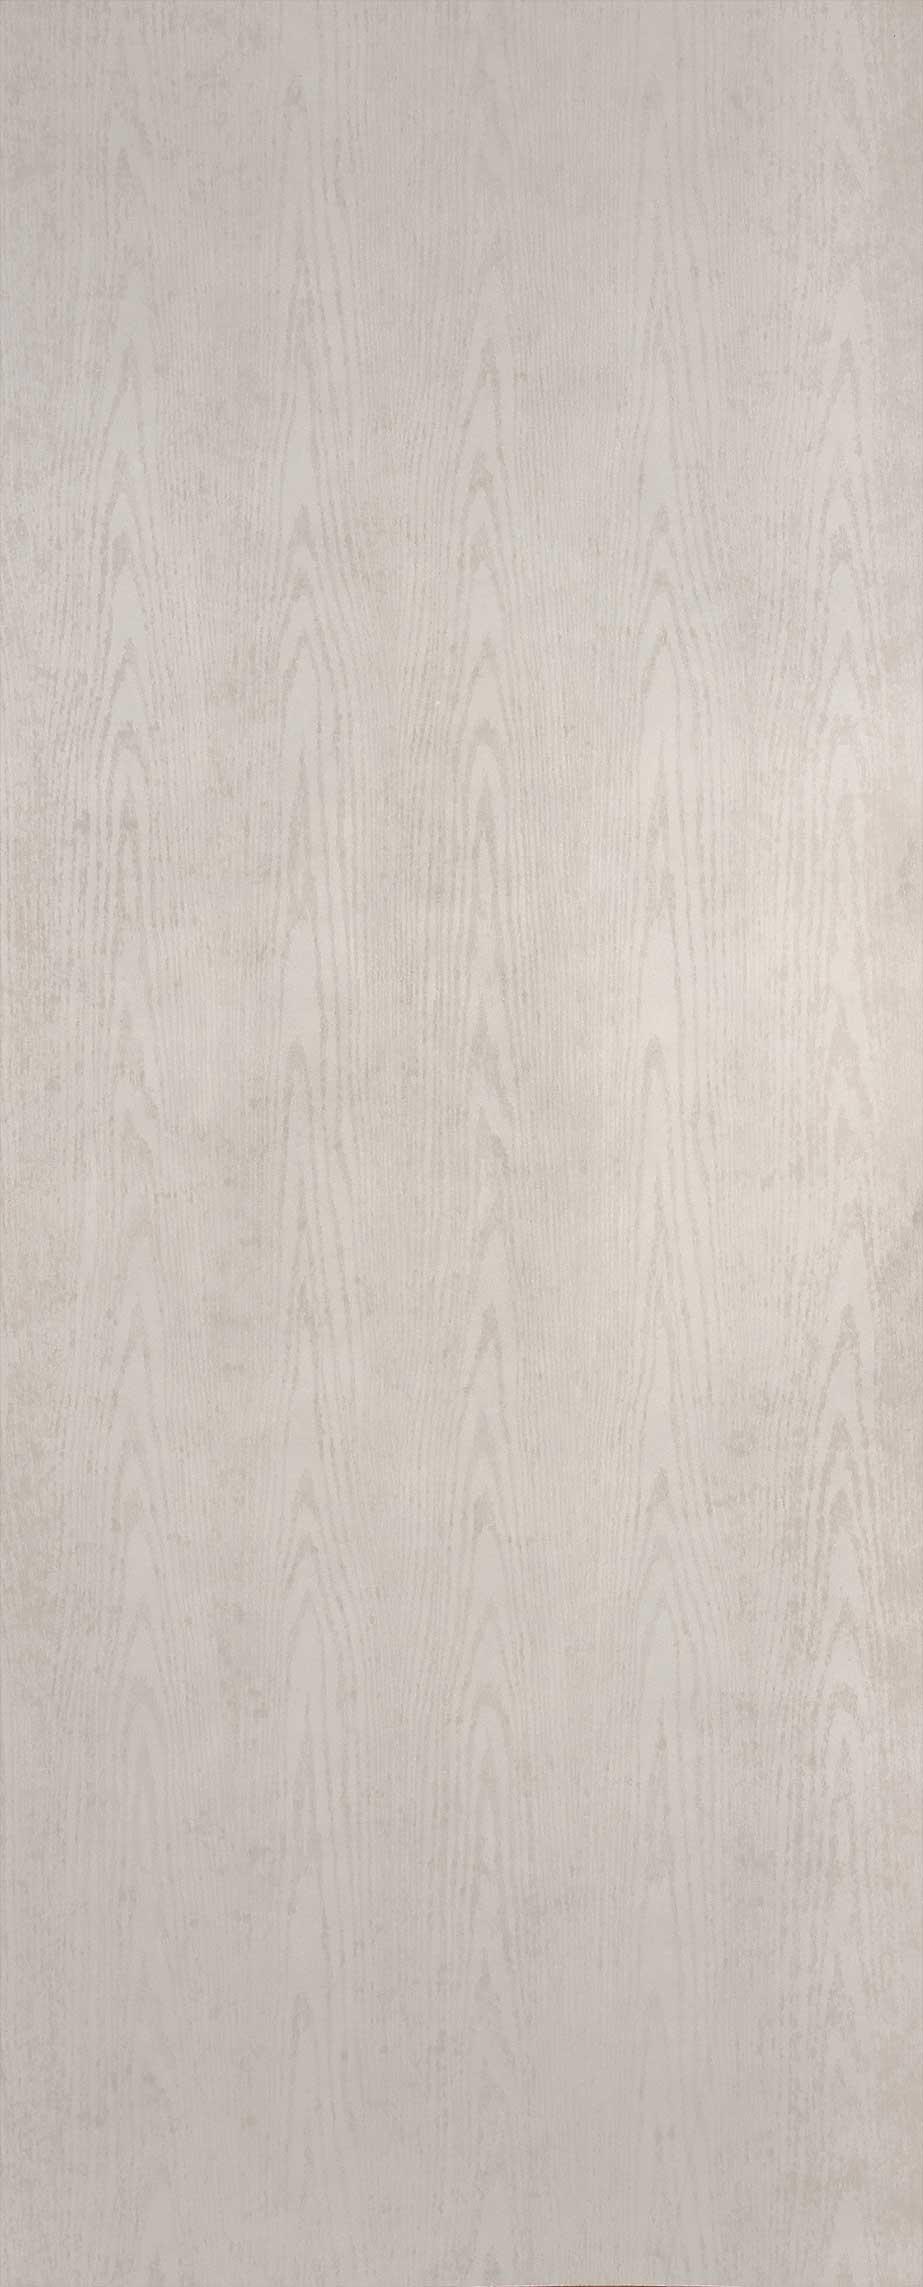 Puerta fibra de vidrio barton puerta residencial - Puertas de fibra de vidrio ...